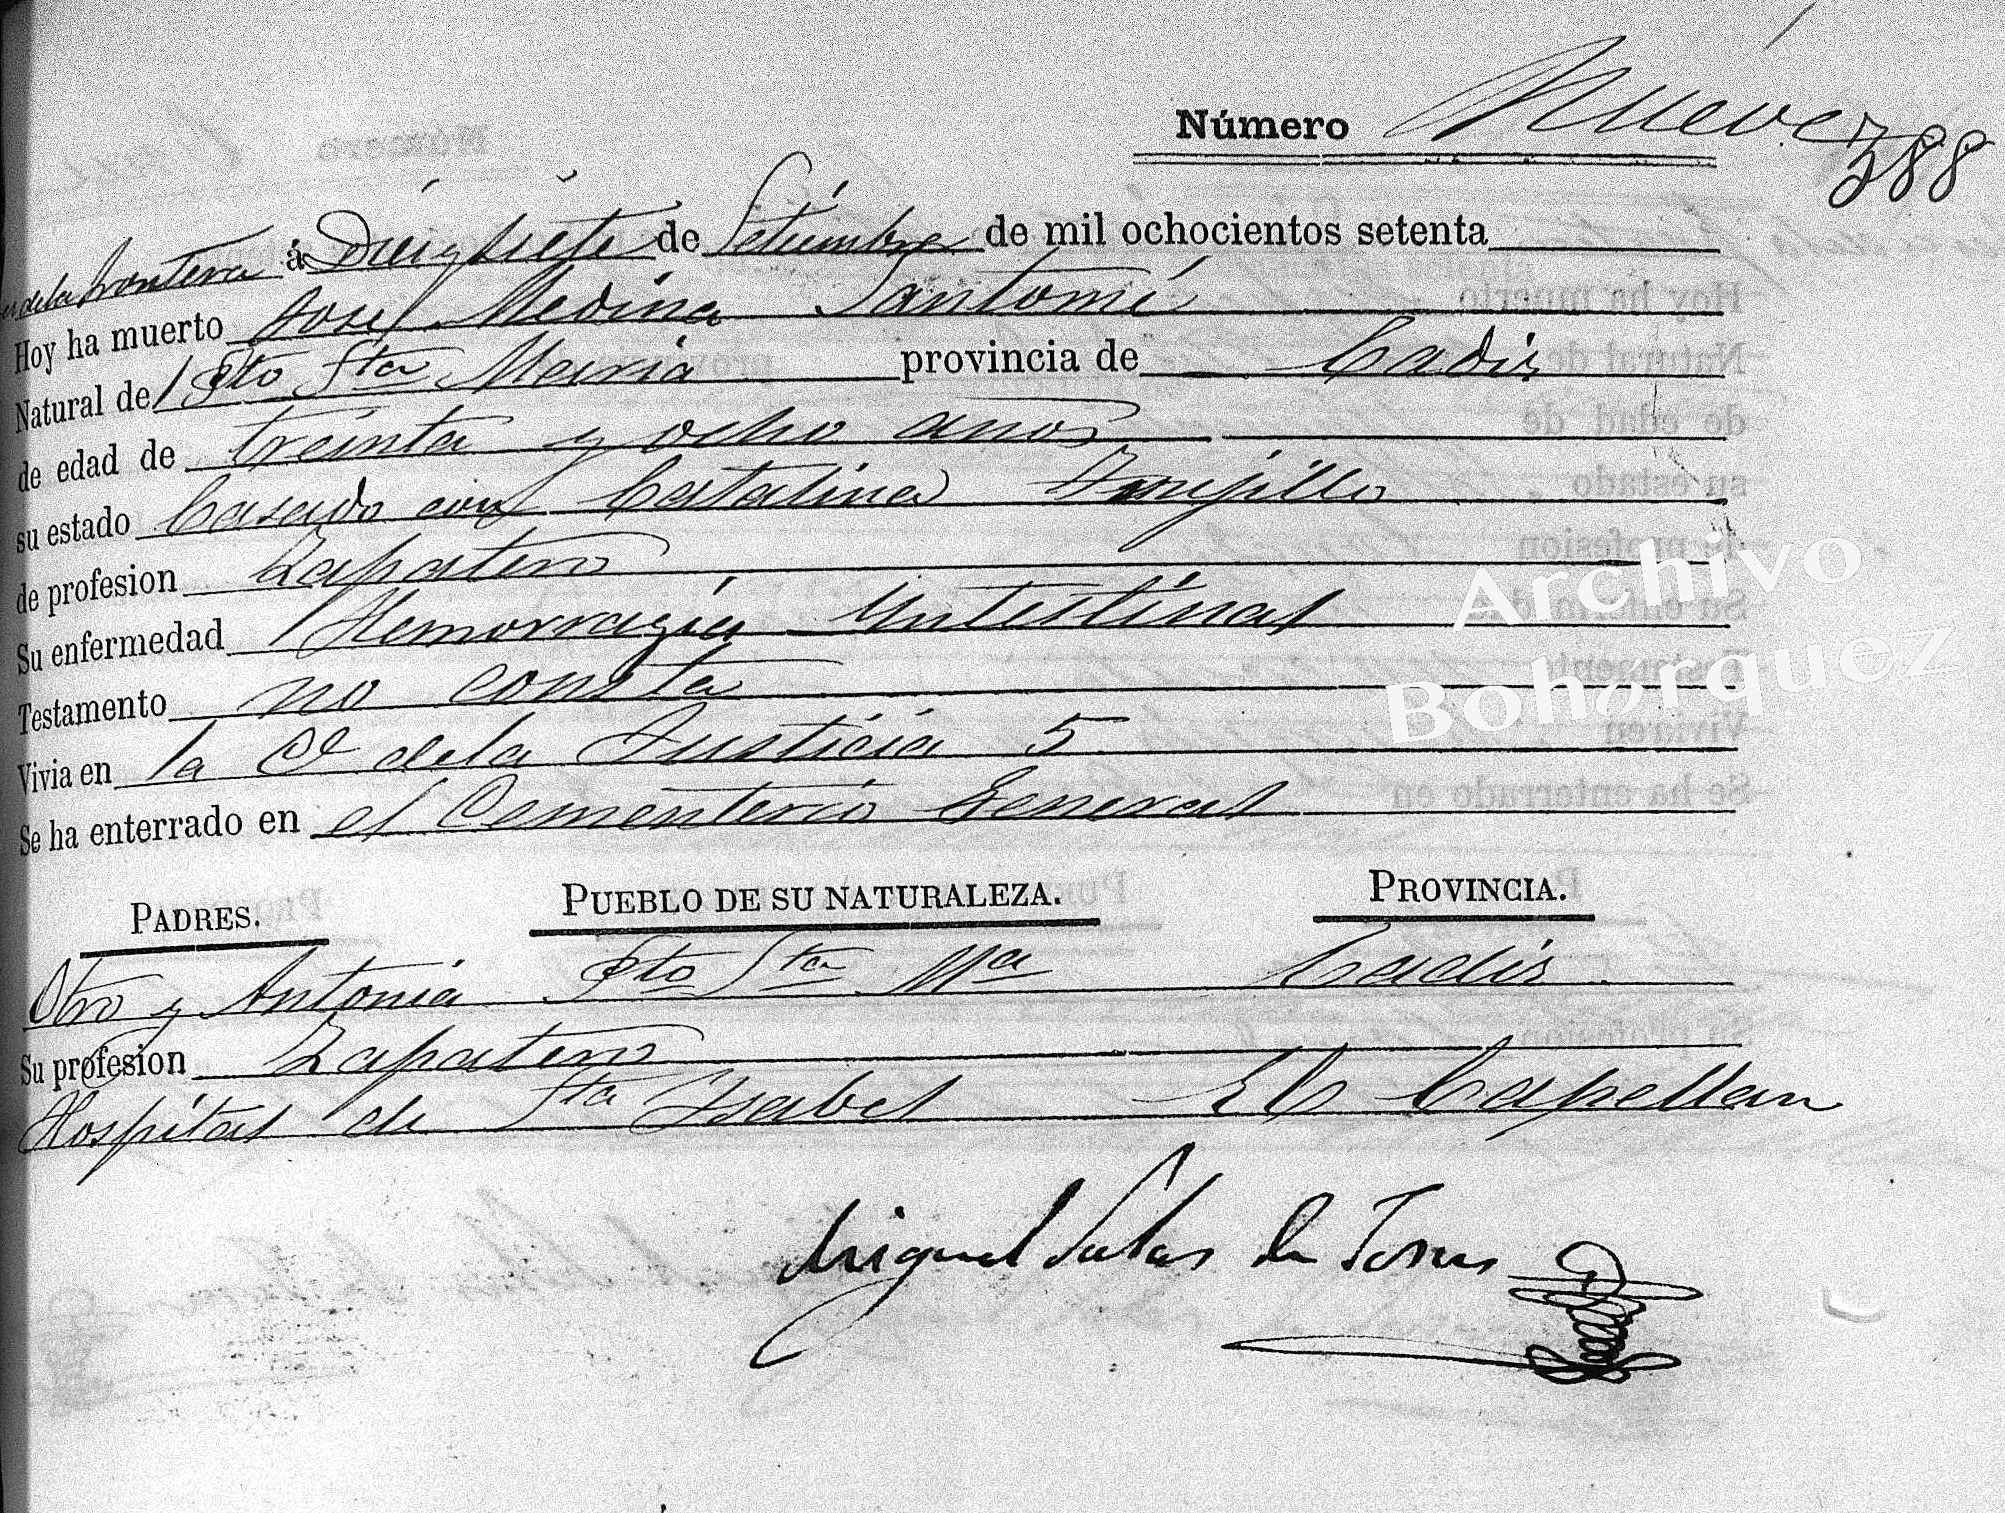 Muerte del padre de José Medina en la calle Justicia de Jerez, por San Mateo, 1870. Archivo Bohórquez.